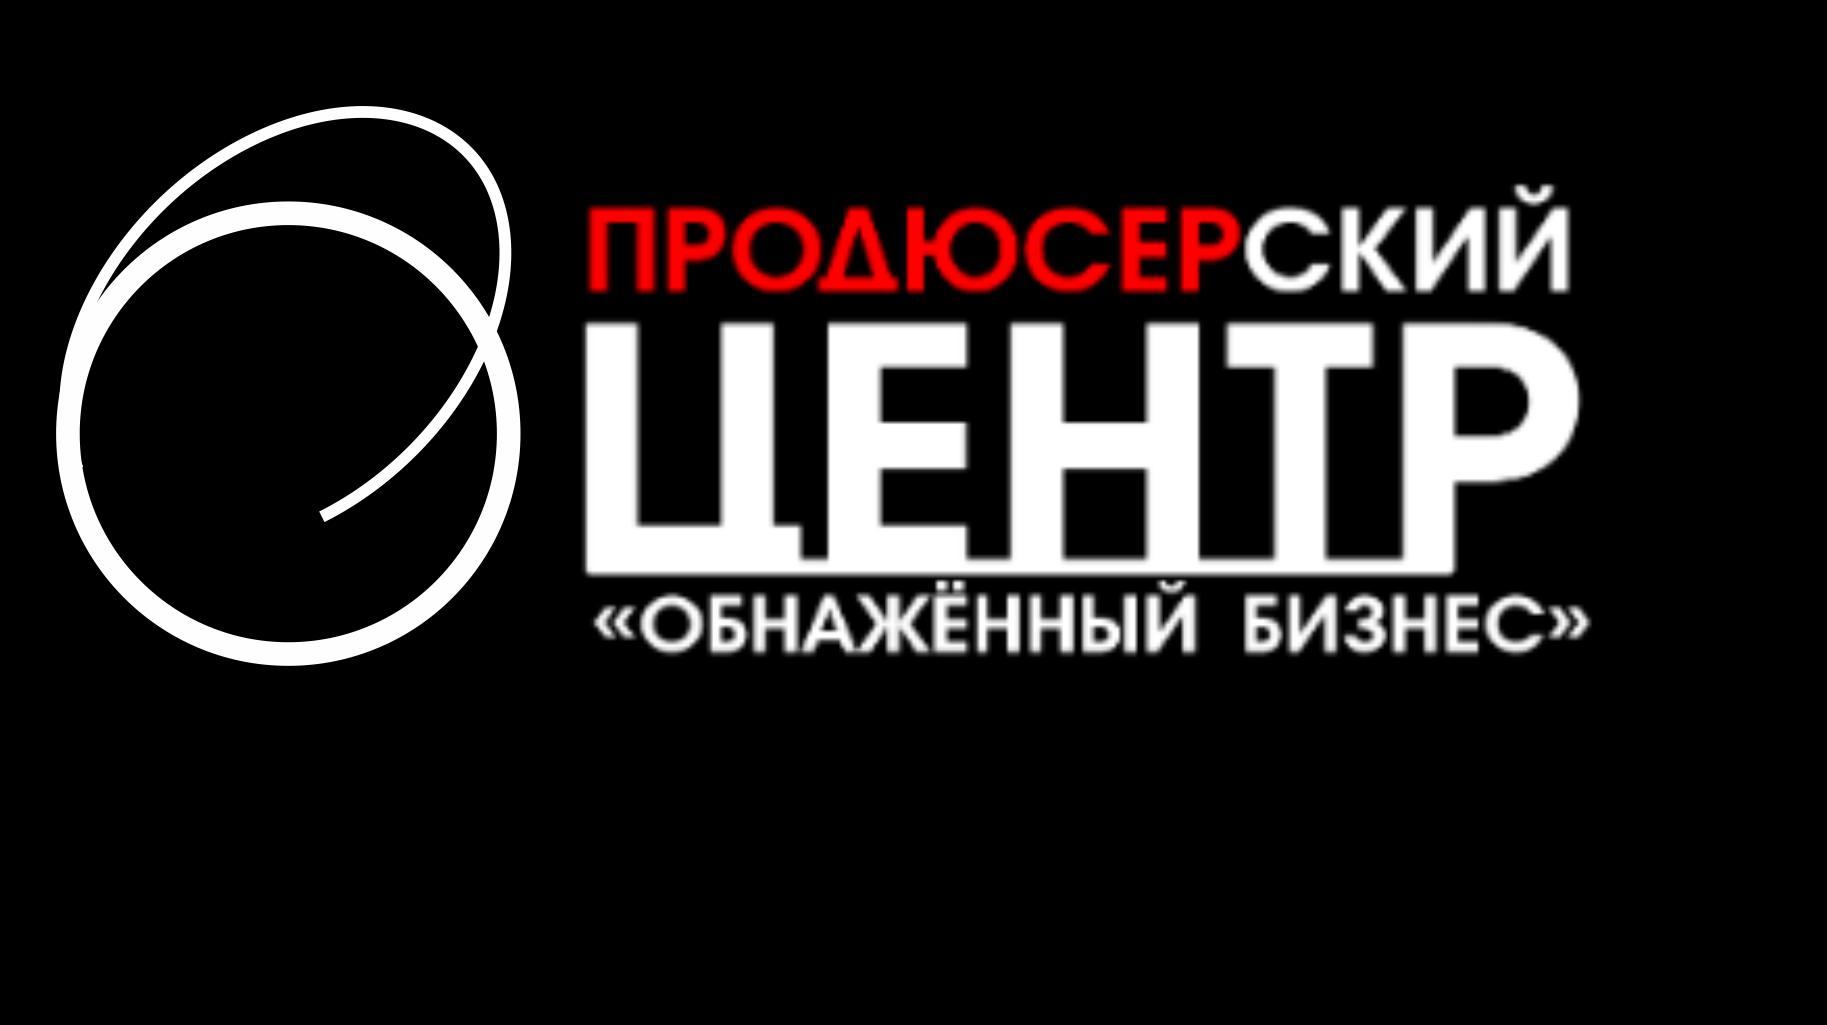 "Логотип для продюсерского центра ""Обнажённый бизнес"" фото f_3025b9c1d1b22445.png"